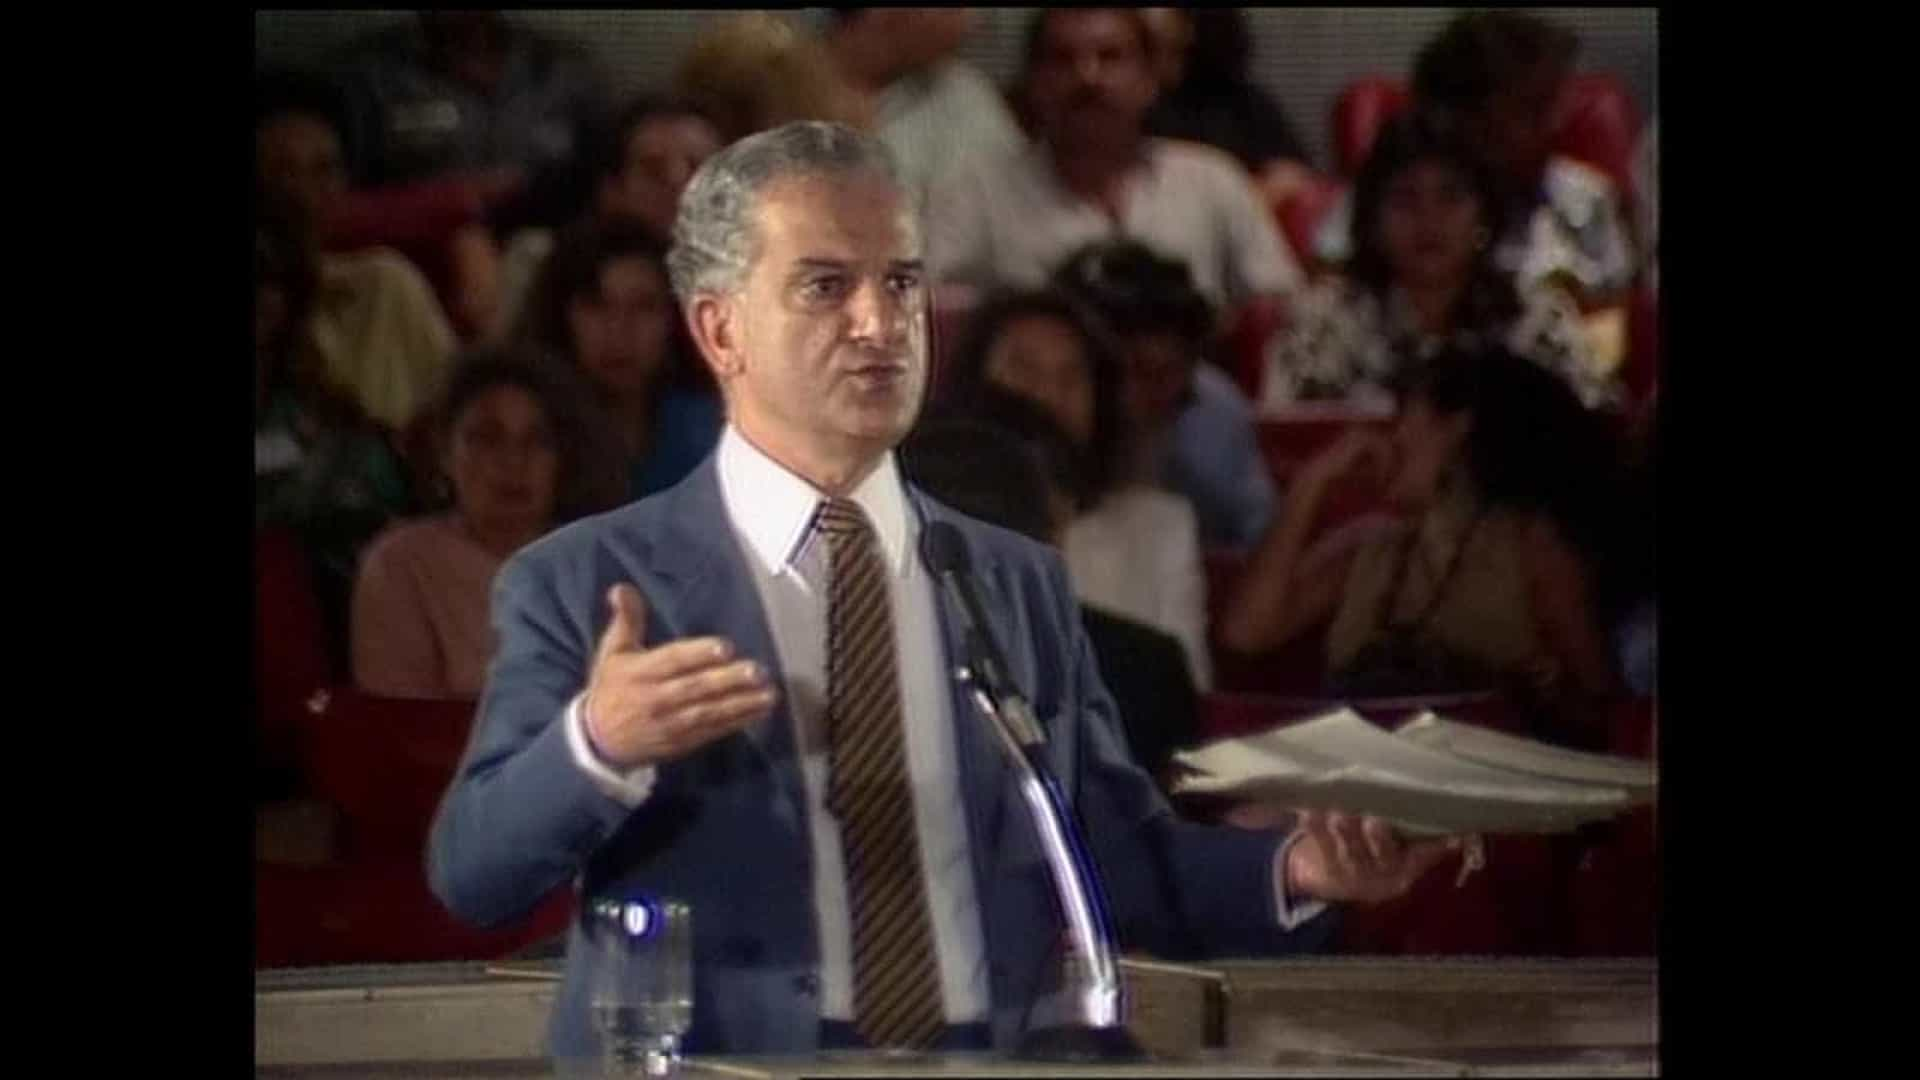 Morre Wilson Mirza, um dos principais criminalistas brasileiros